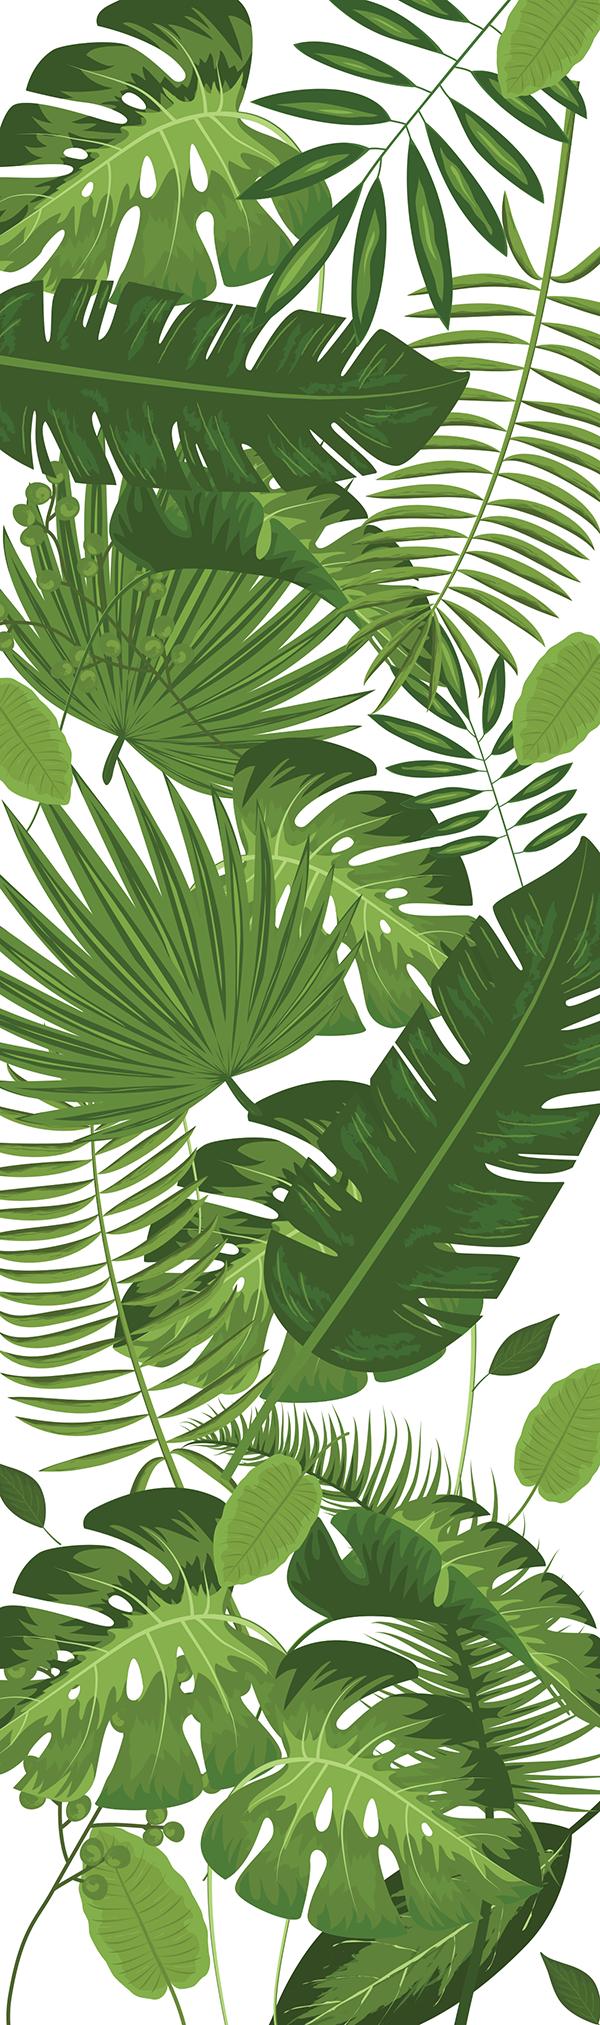 TENSTICKERS. ジャングルの木冷蔵庫ラップデカール. 冷蔵庫の表面を飾る装飾的な植物冷蔵庫ドアステッカー。必要なサイズがあり、簡単に適用できます。